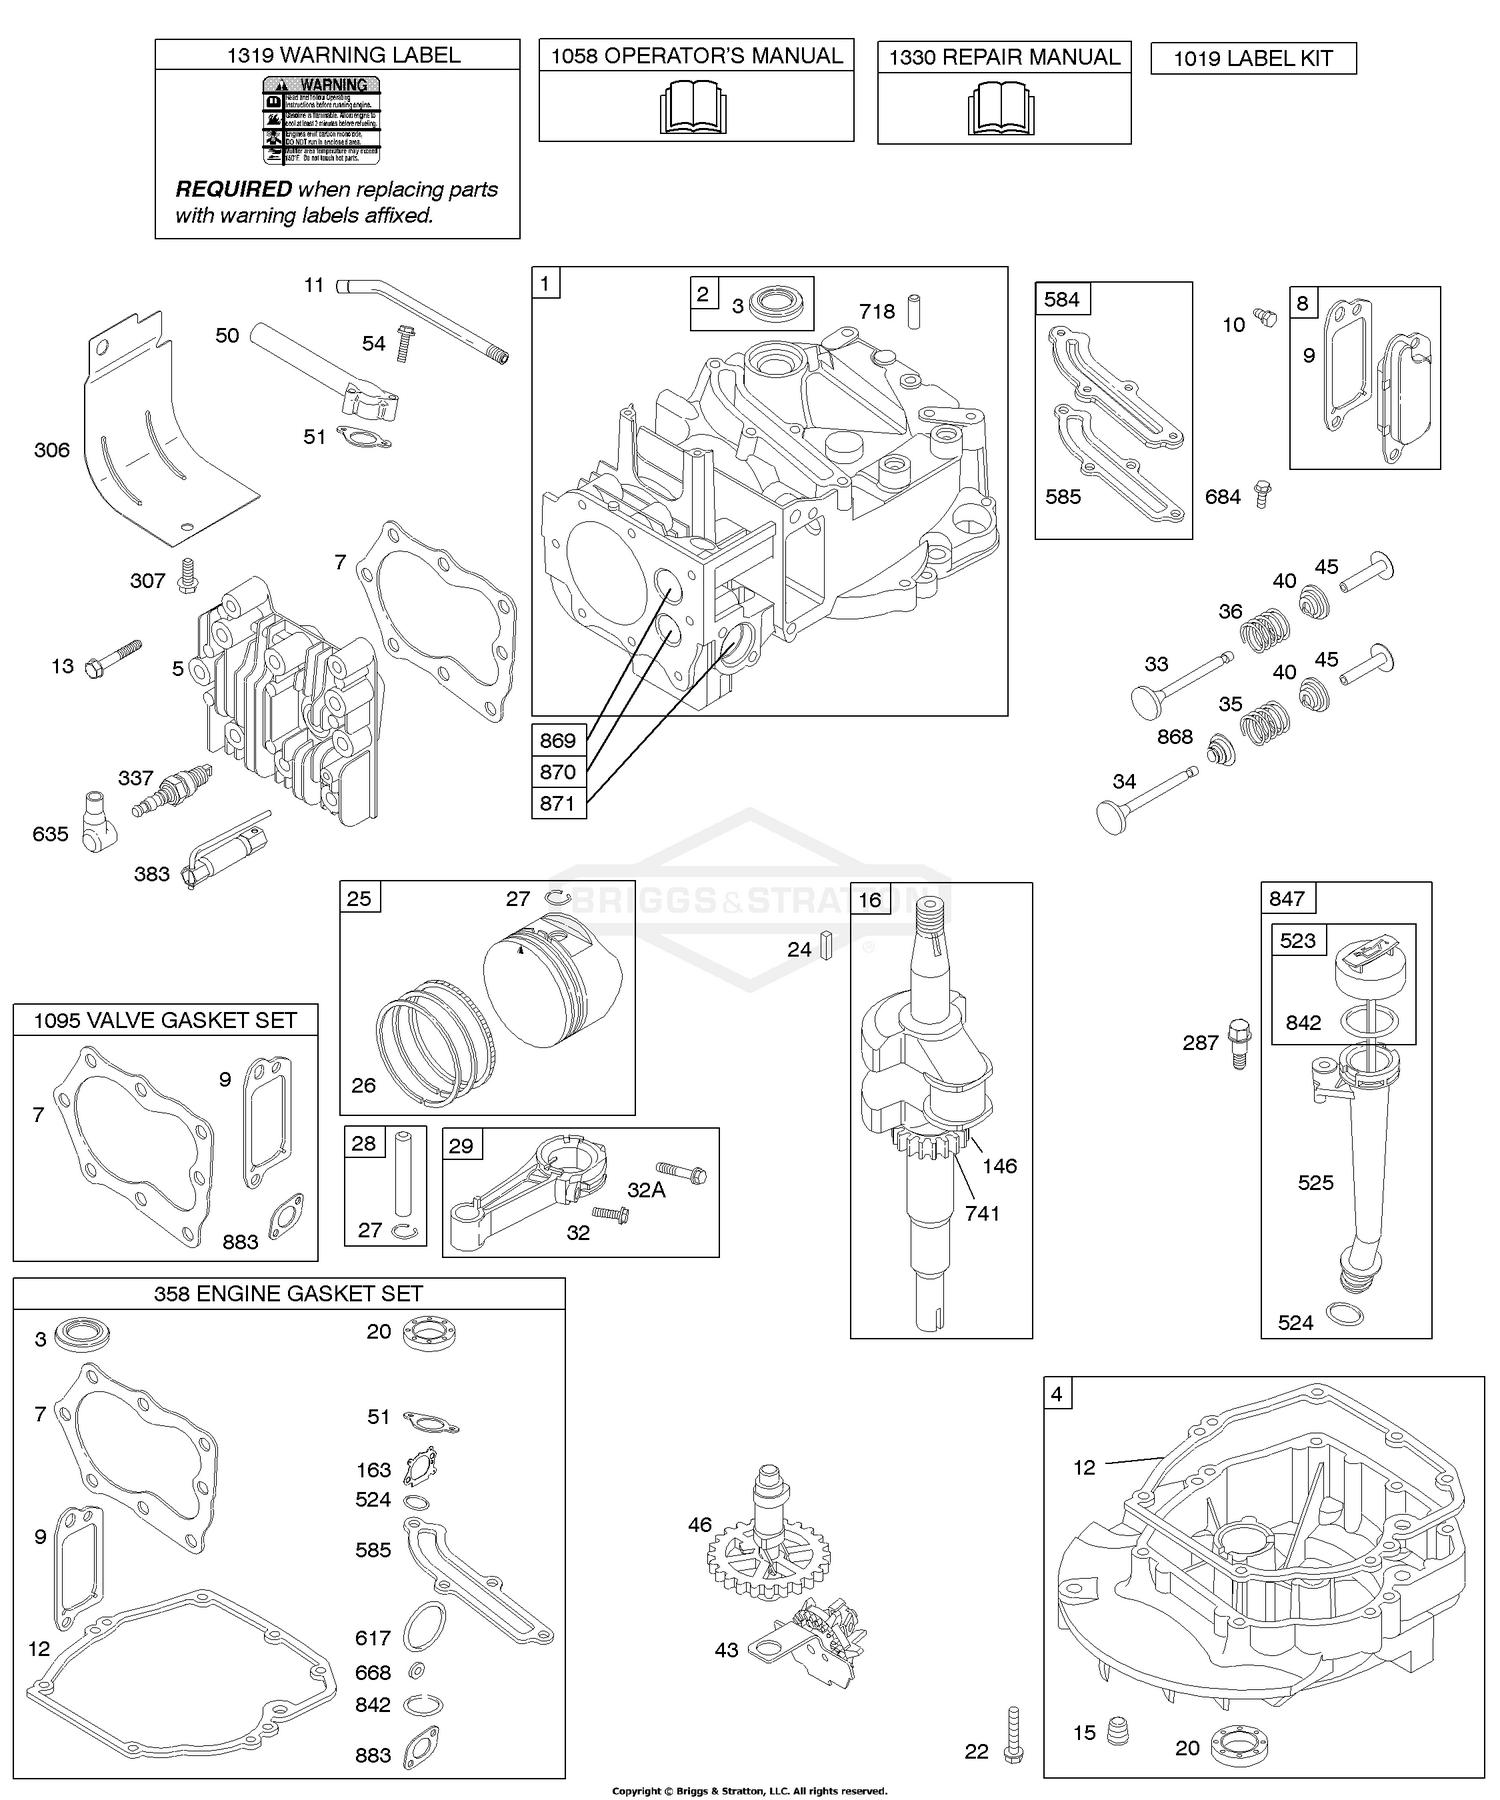 Briggs And Stratton 123h02 0110 B1 Camshaft Crankshaft Cylinder Engine Diagram Sump Kit Gasket Lubrication Piston